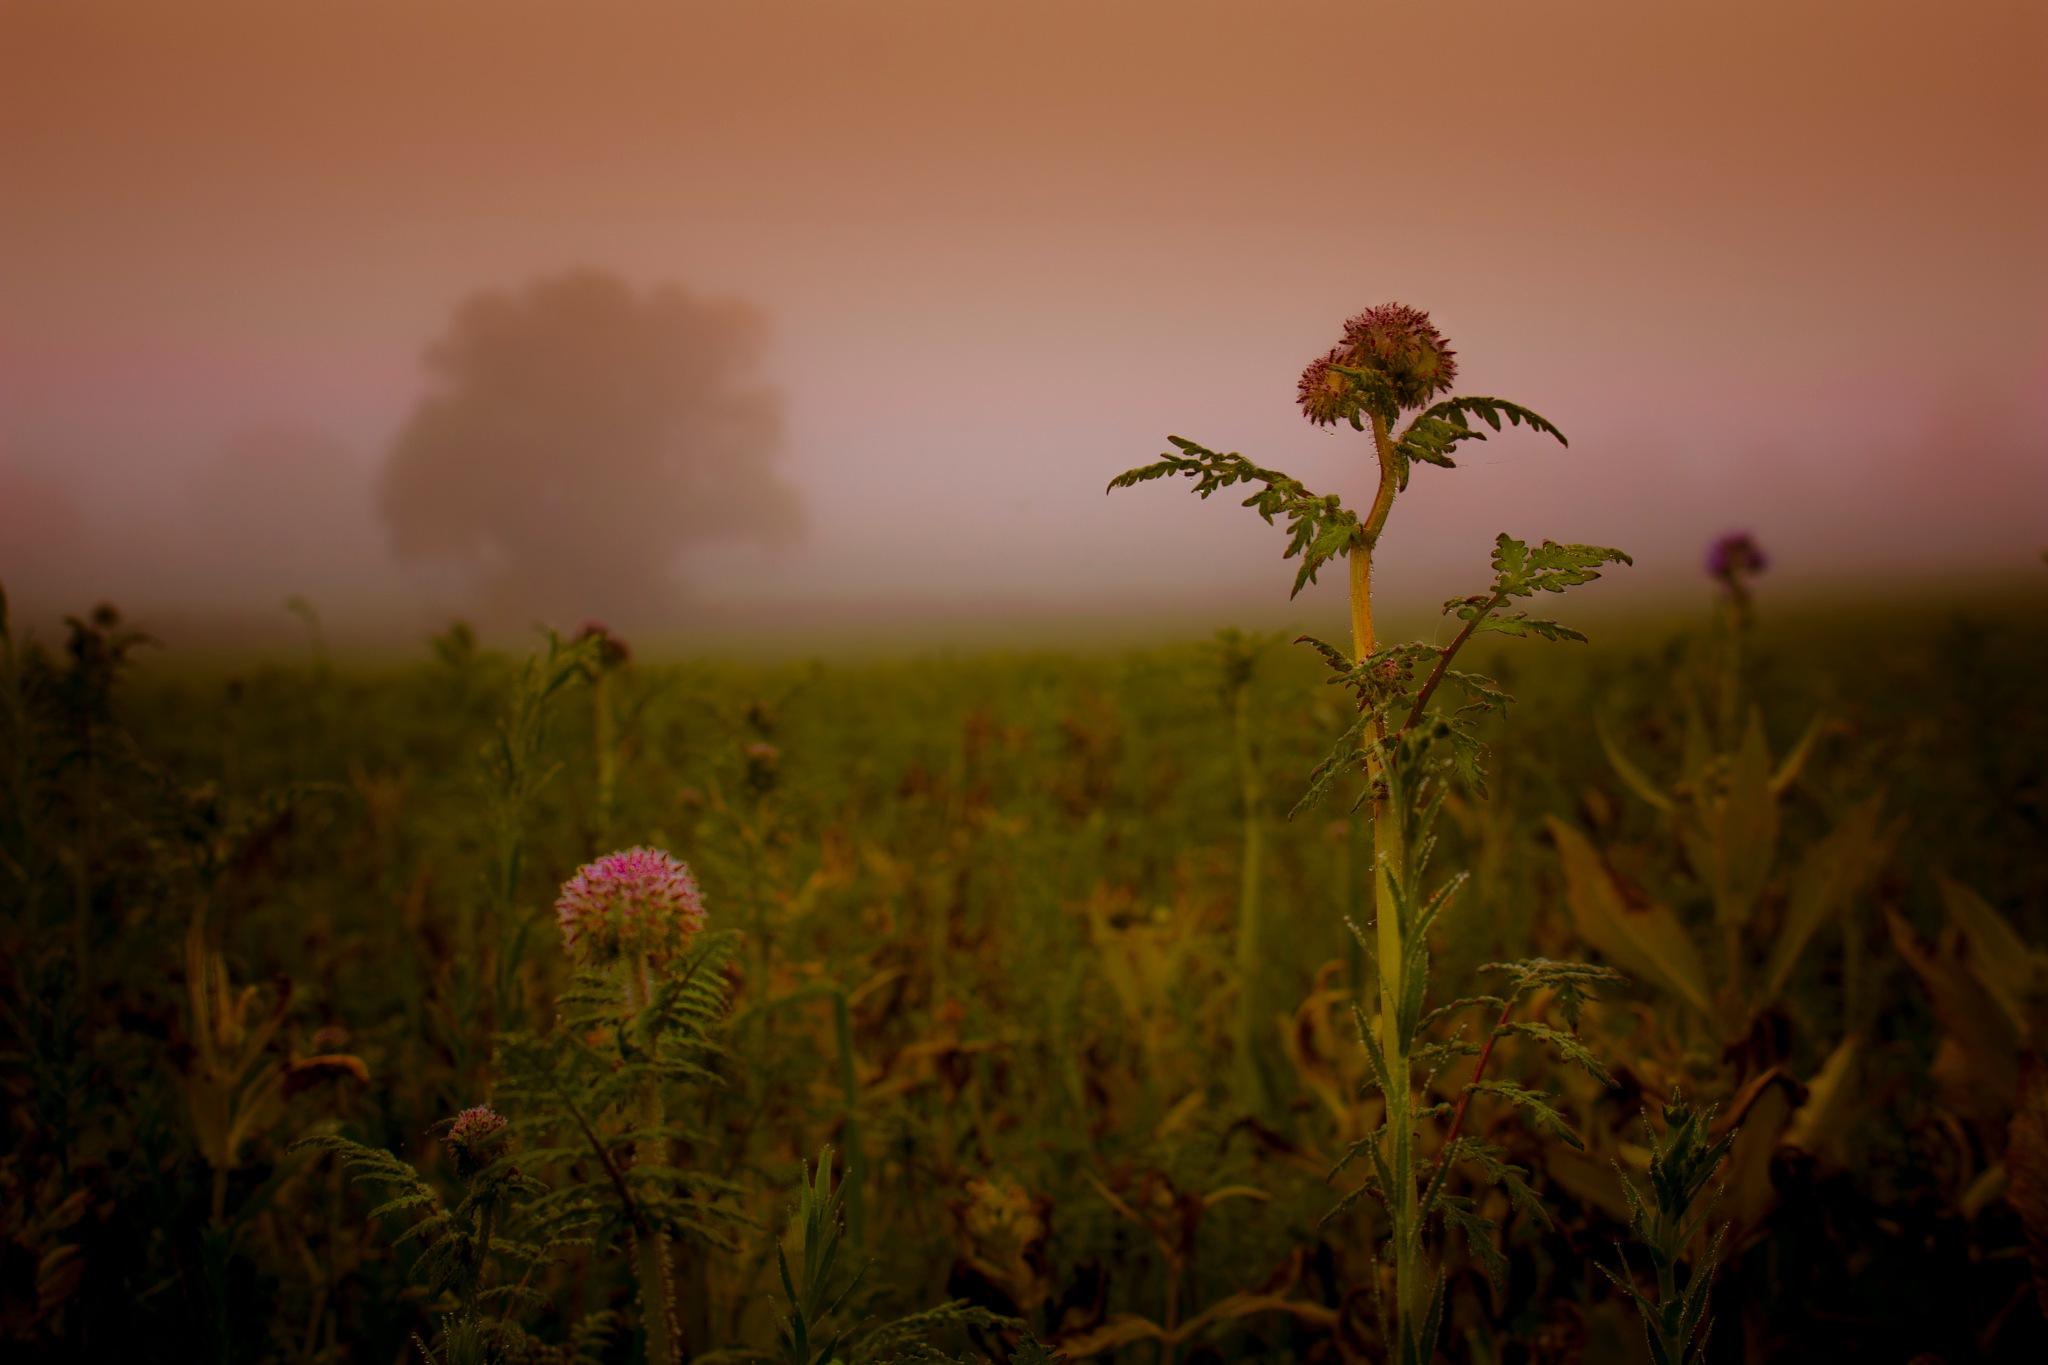 late October mist by John Palmer